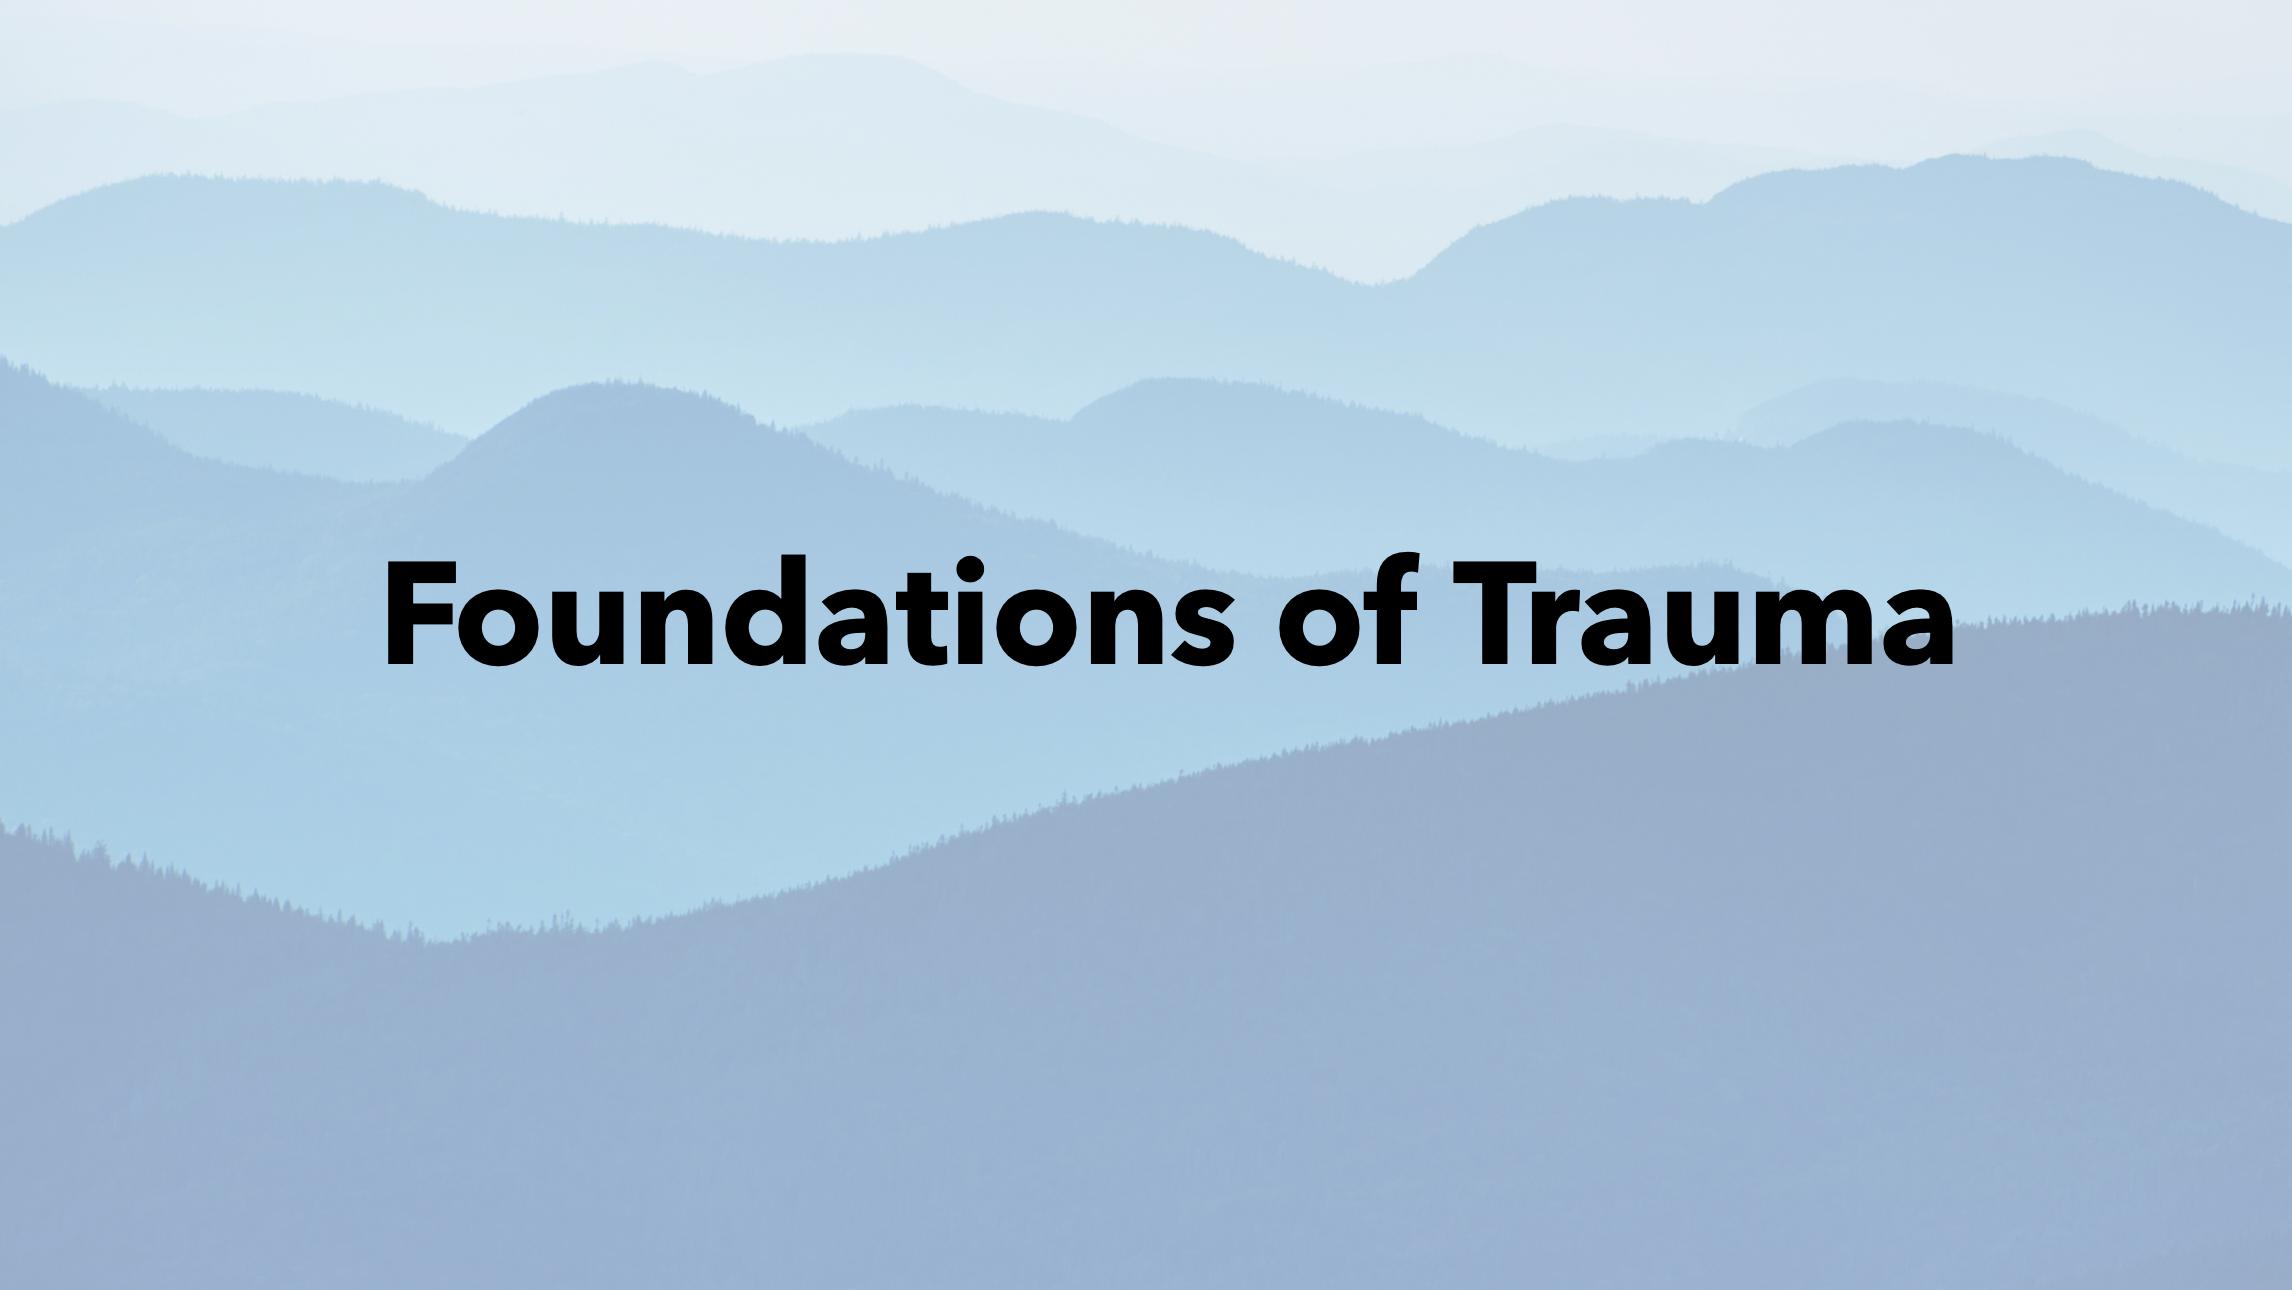 Australia: Foundations of Trauma